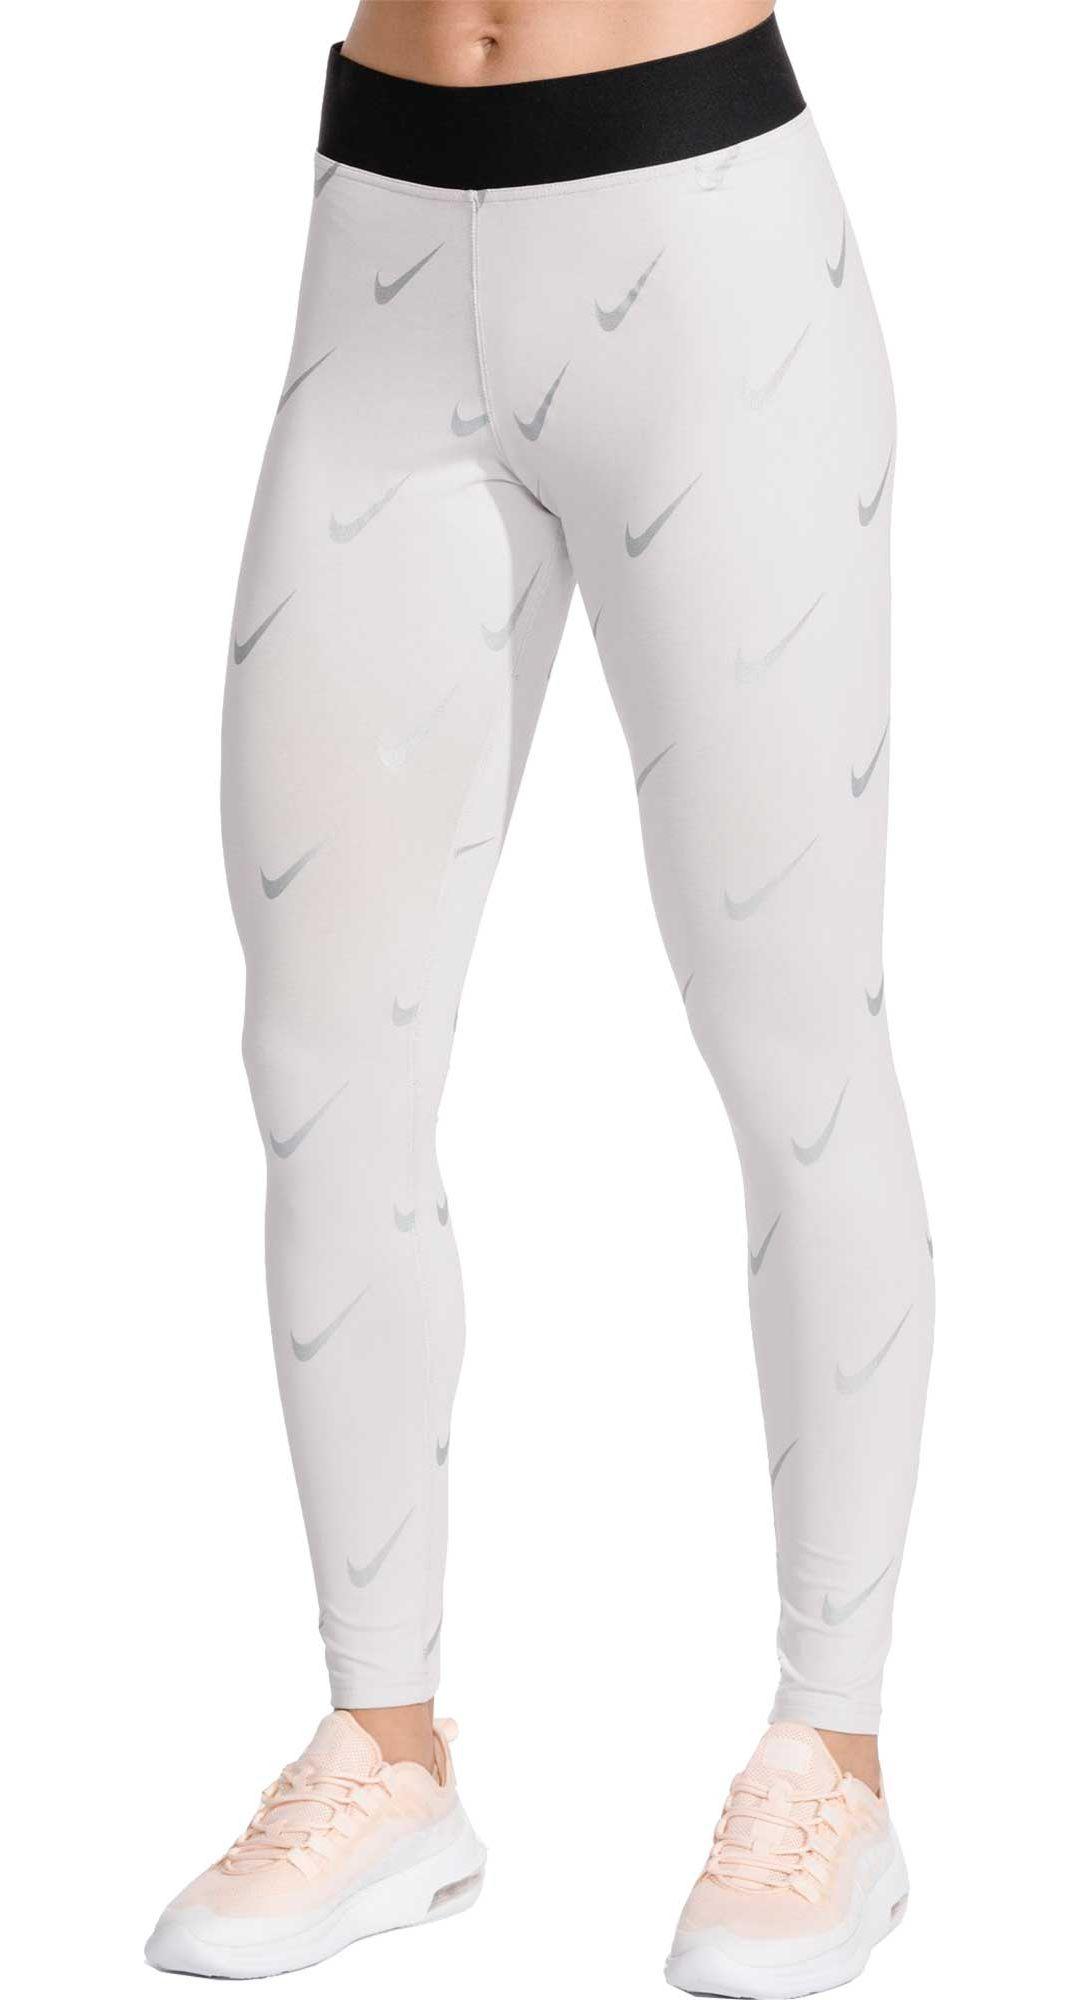 3f78475706 Nike Women's Sportswear Leg-A-See Metallic Leggings | DICK'S ...